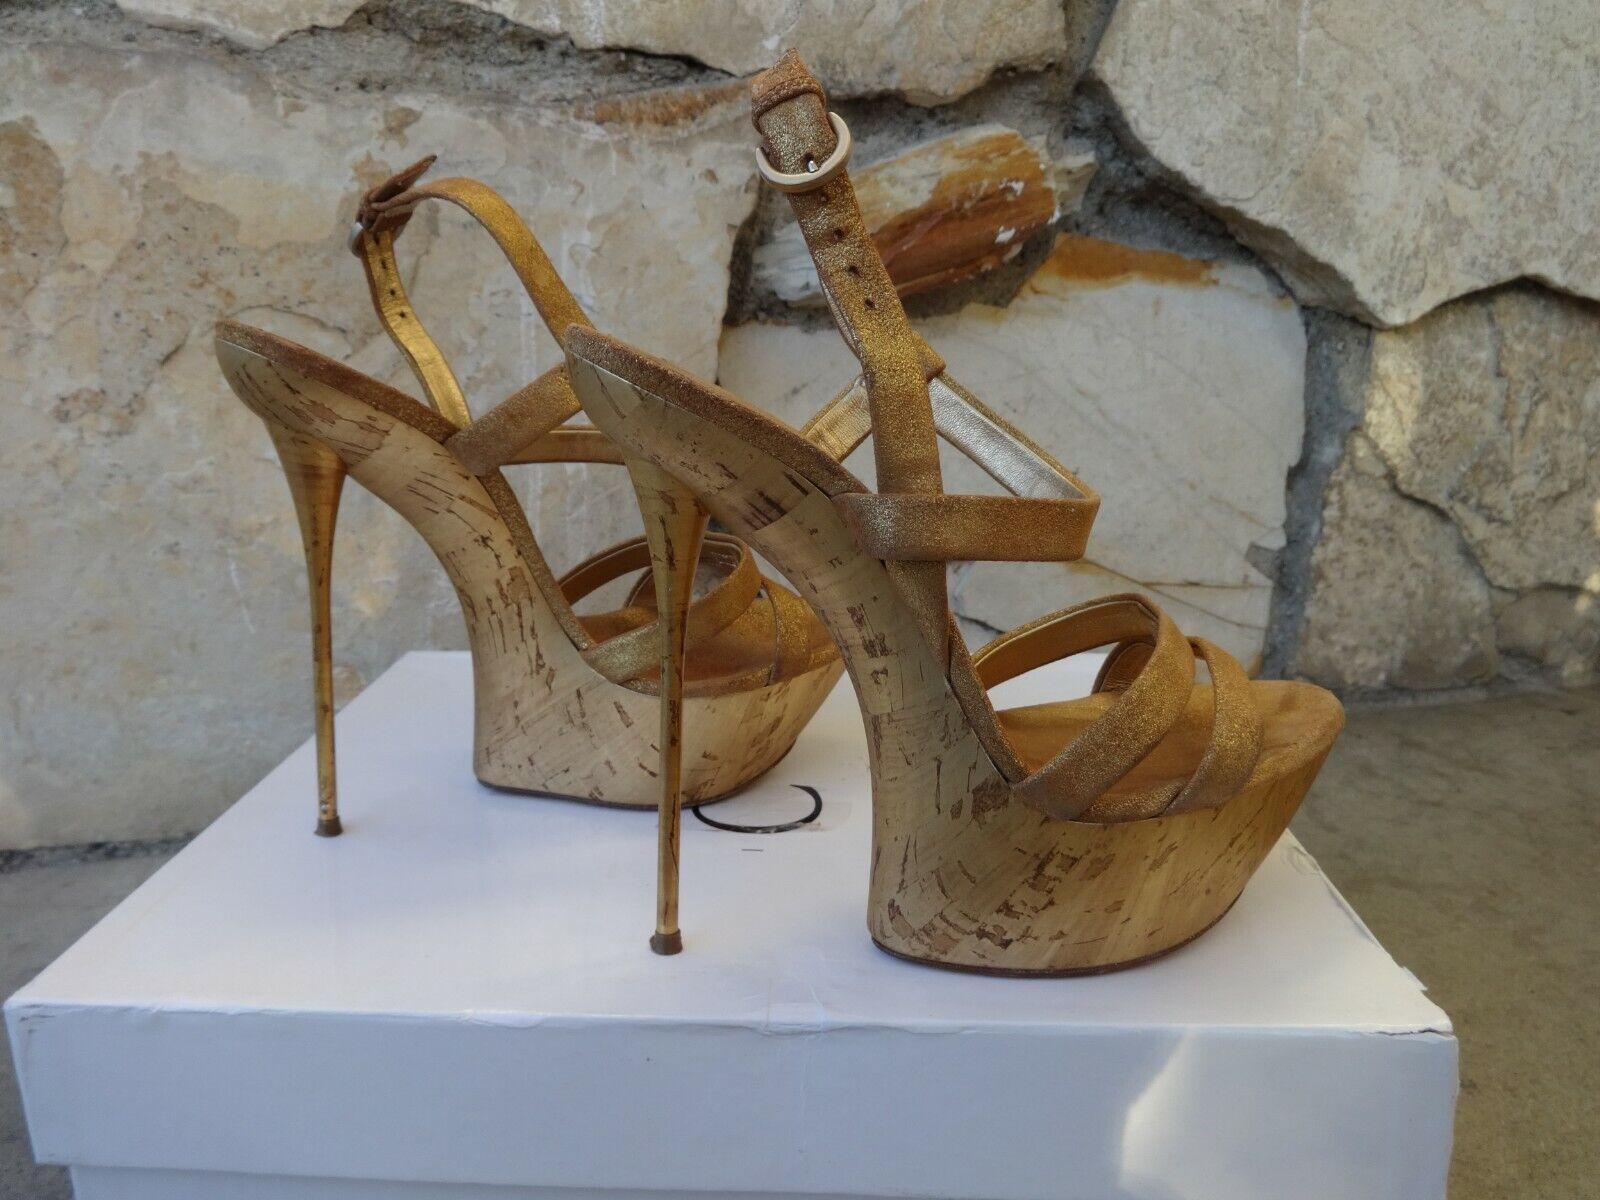 Casadei Skyhigh Skyhigh Skyhigh Metal Heel Ankle Strap Platform Sandals pink gold EU size 8 47b1ea